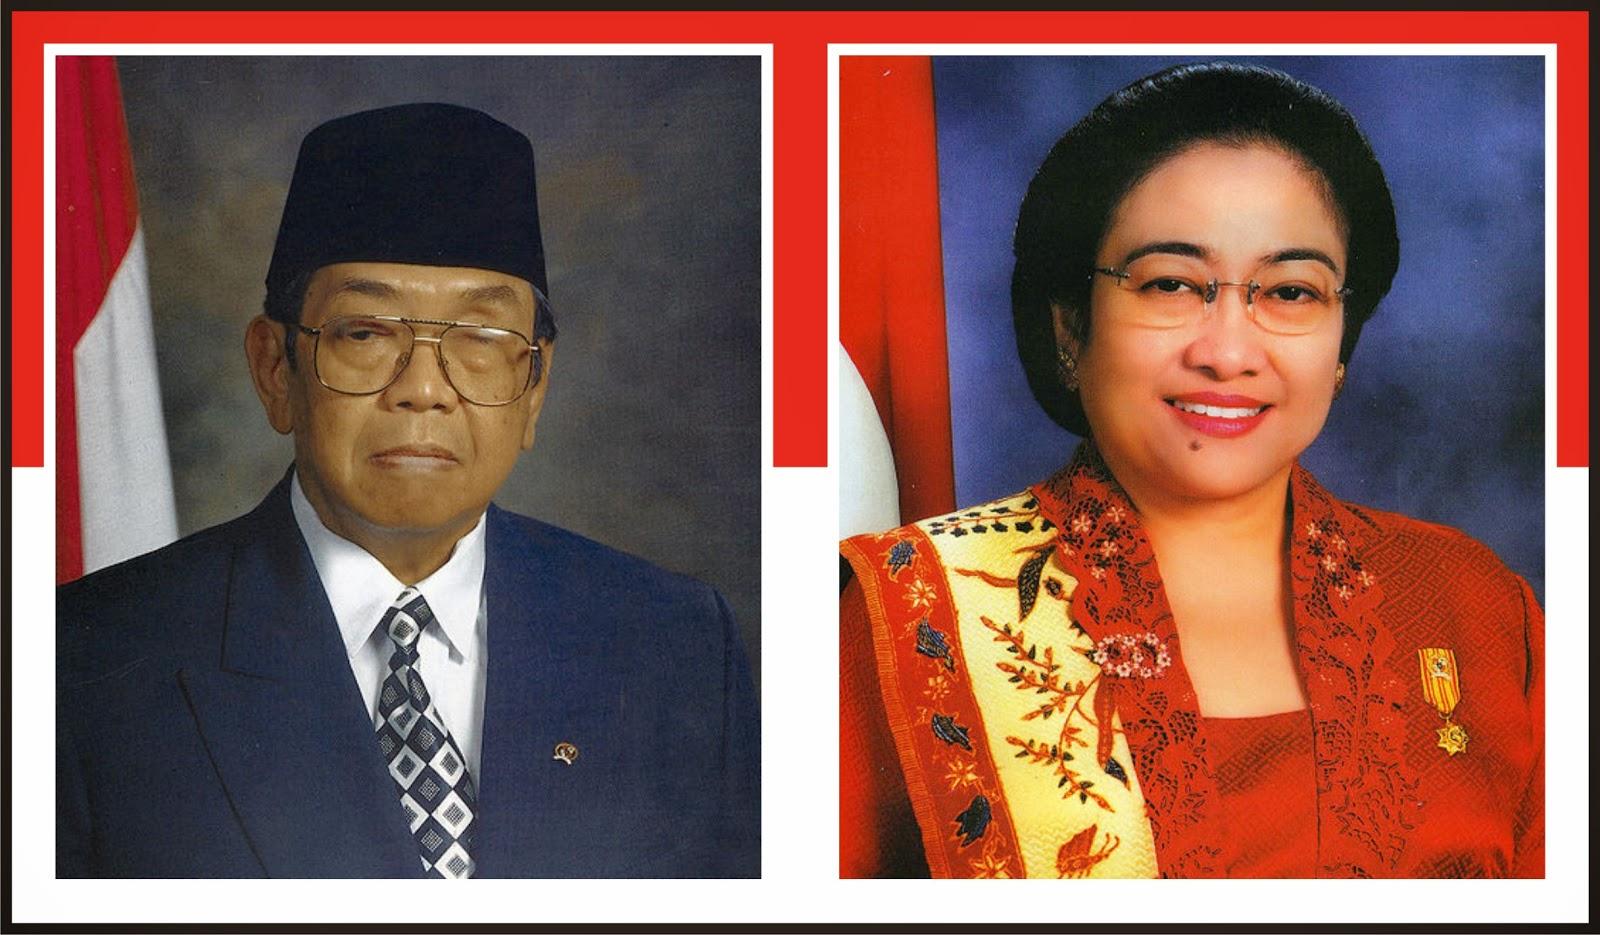 Abdurrahman Wahid dan Megawati Soekarno Putri